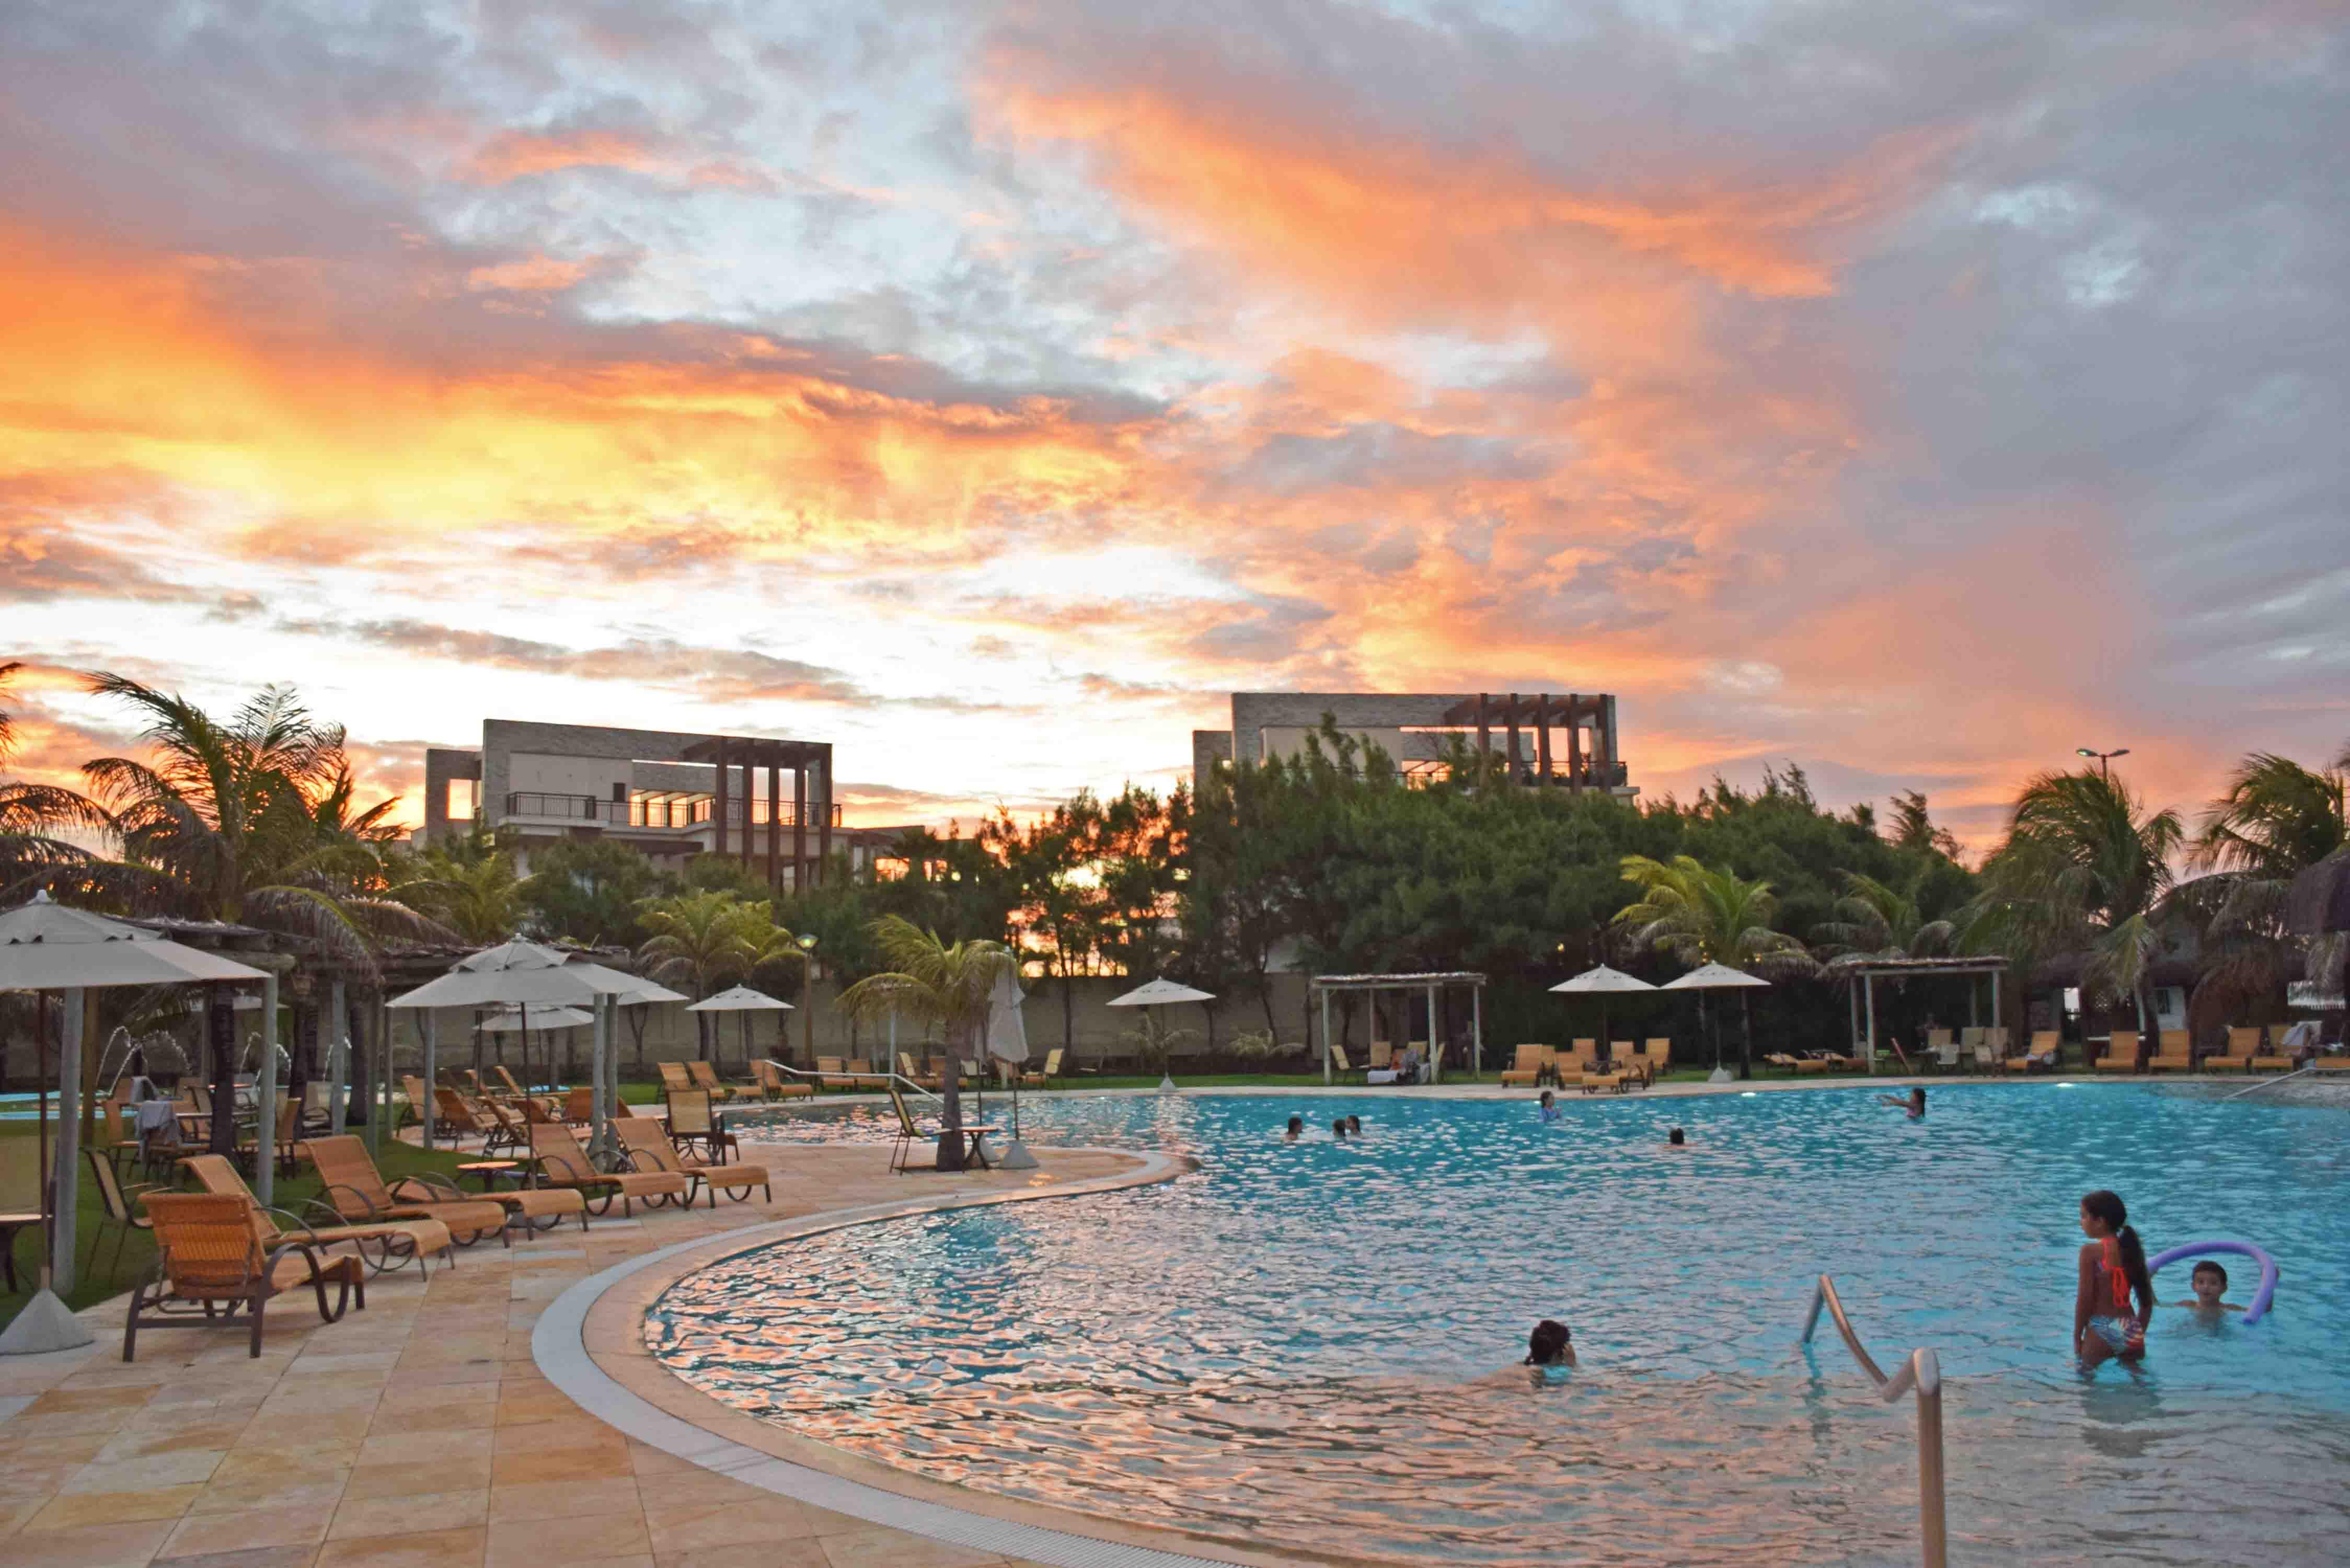 hotel dom pedro laguna ceara aquiraz piscina